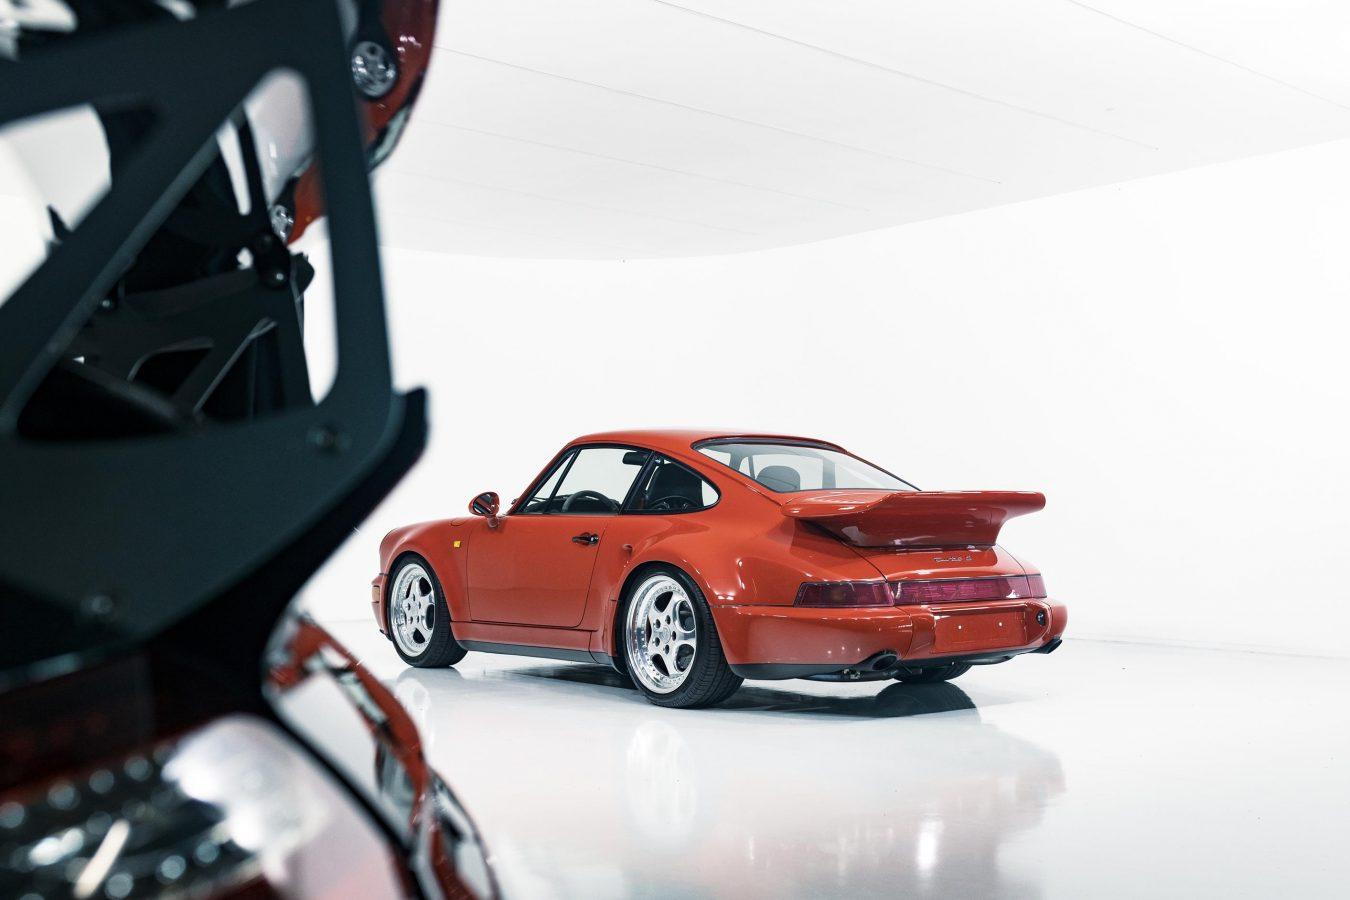 Porsche 911 Turbo S 4